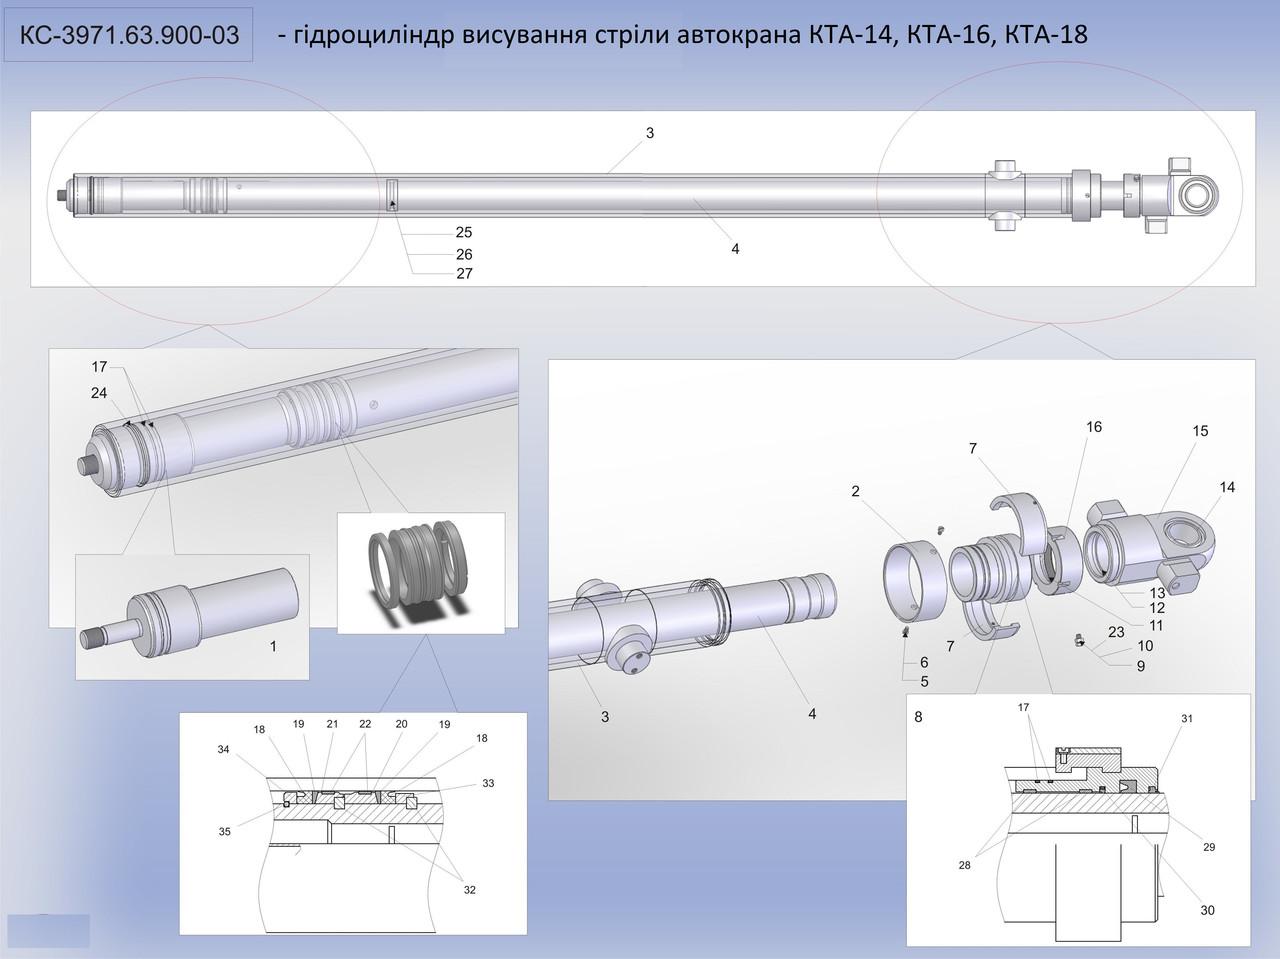 Гидроцилиндр выдвижения стрелы  автокрана КТА-16, КТА-18